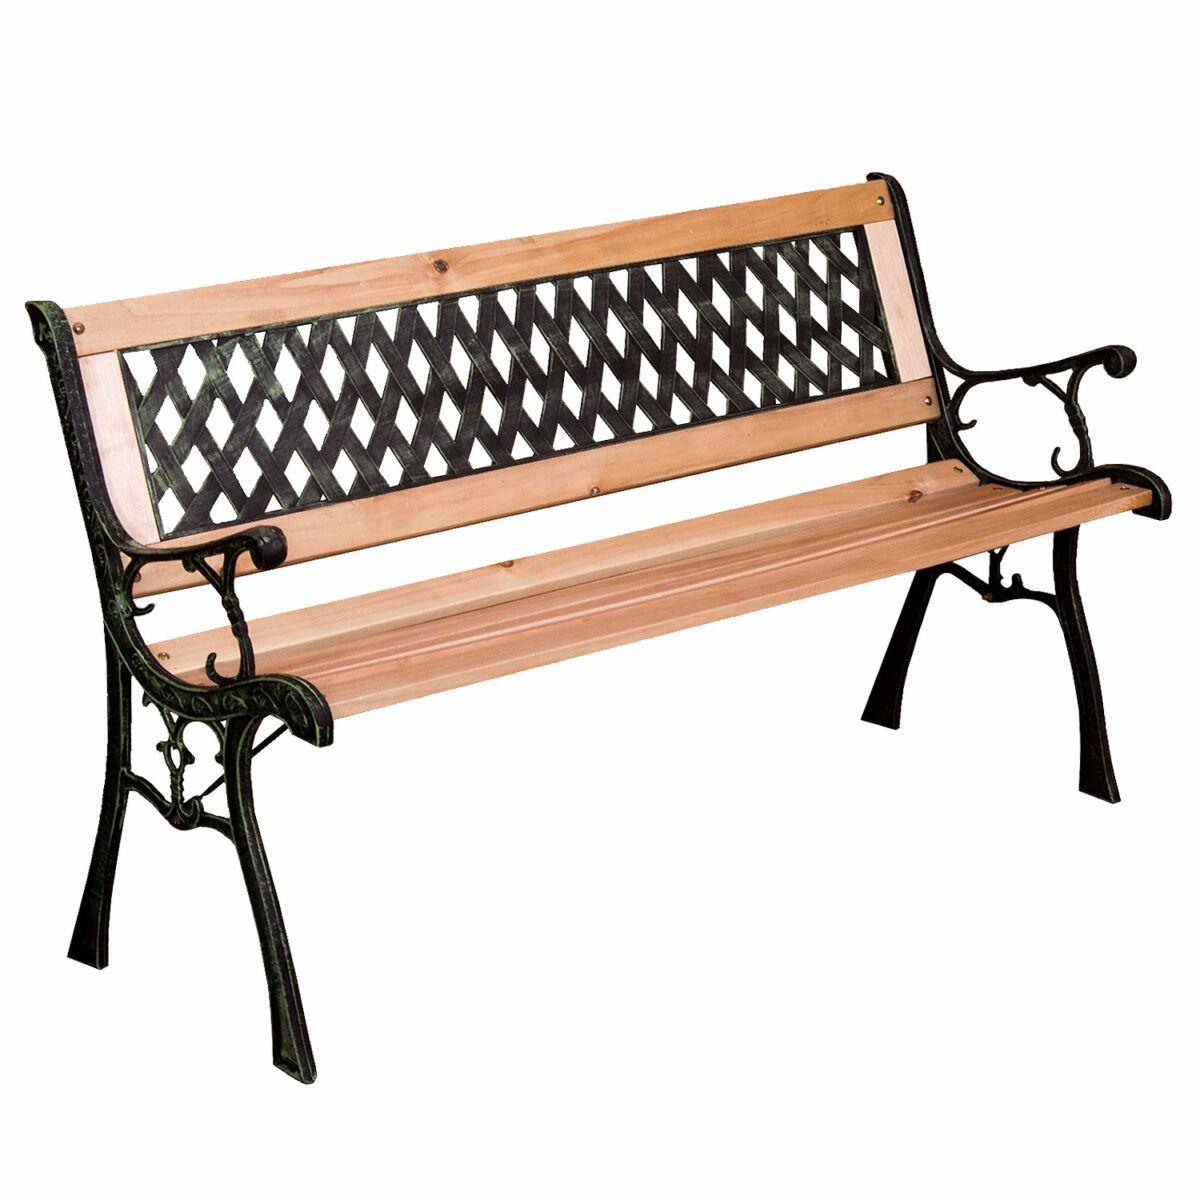 Metal 2 or 3 Seater Garden Bench – Blenheim - £30 delivered @ Weeklydeals4less